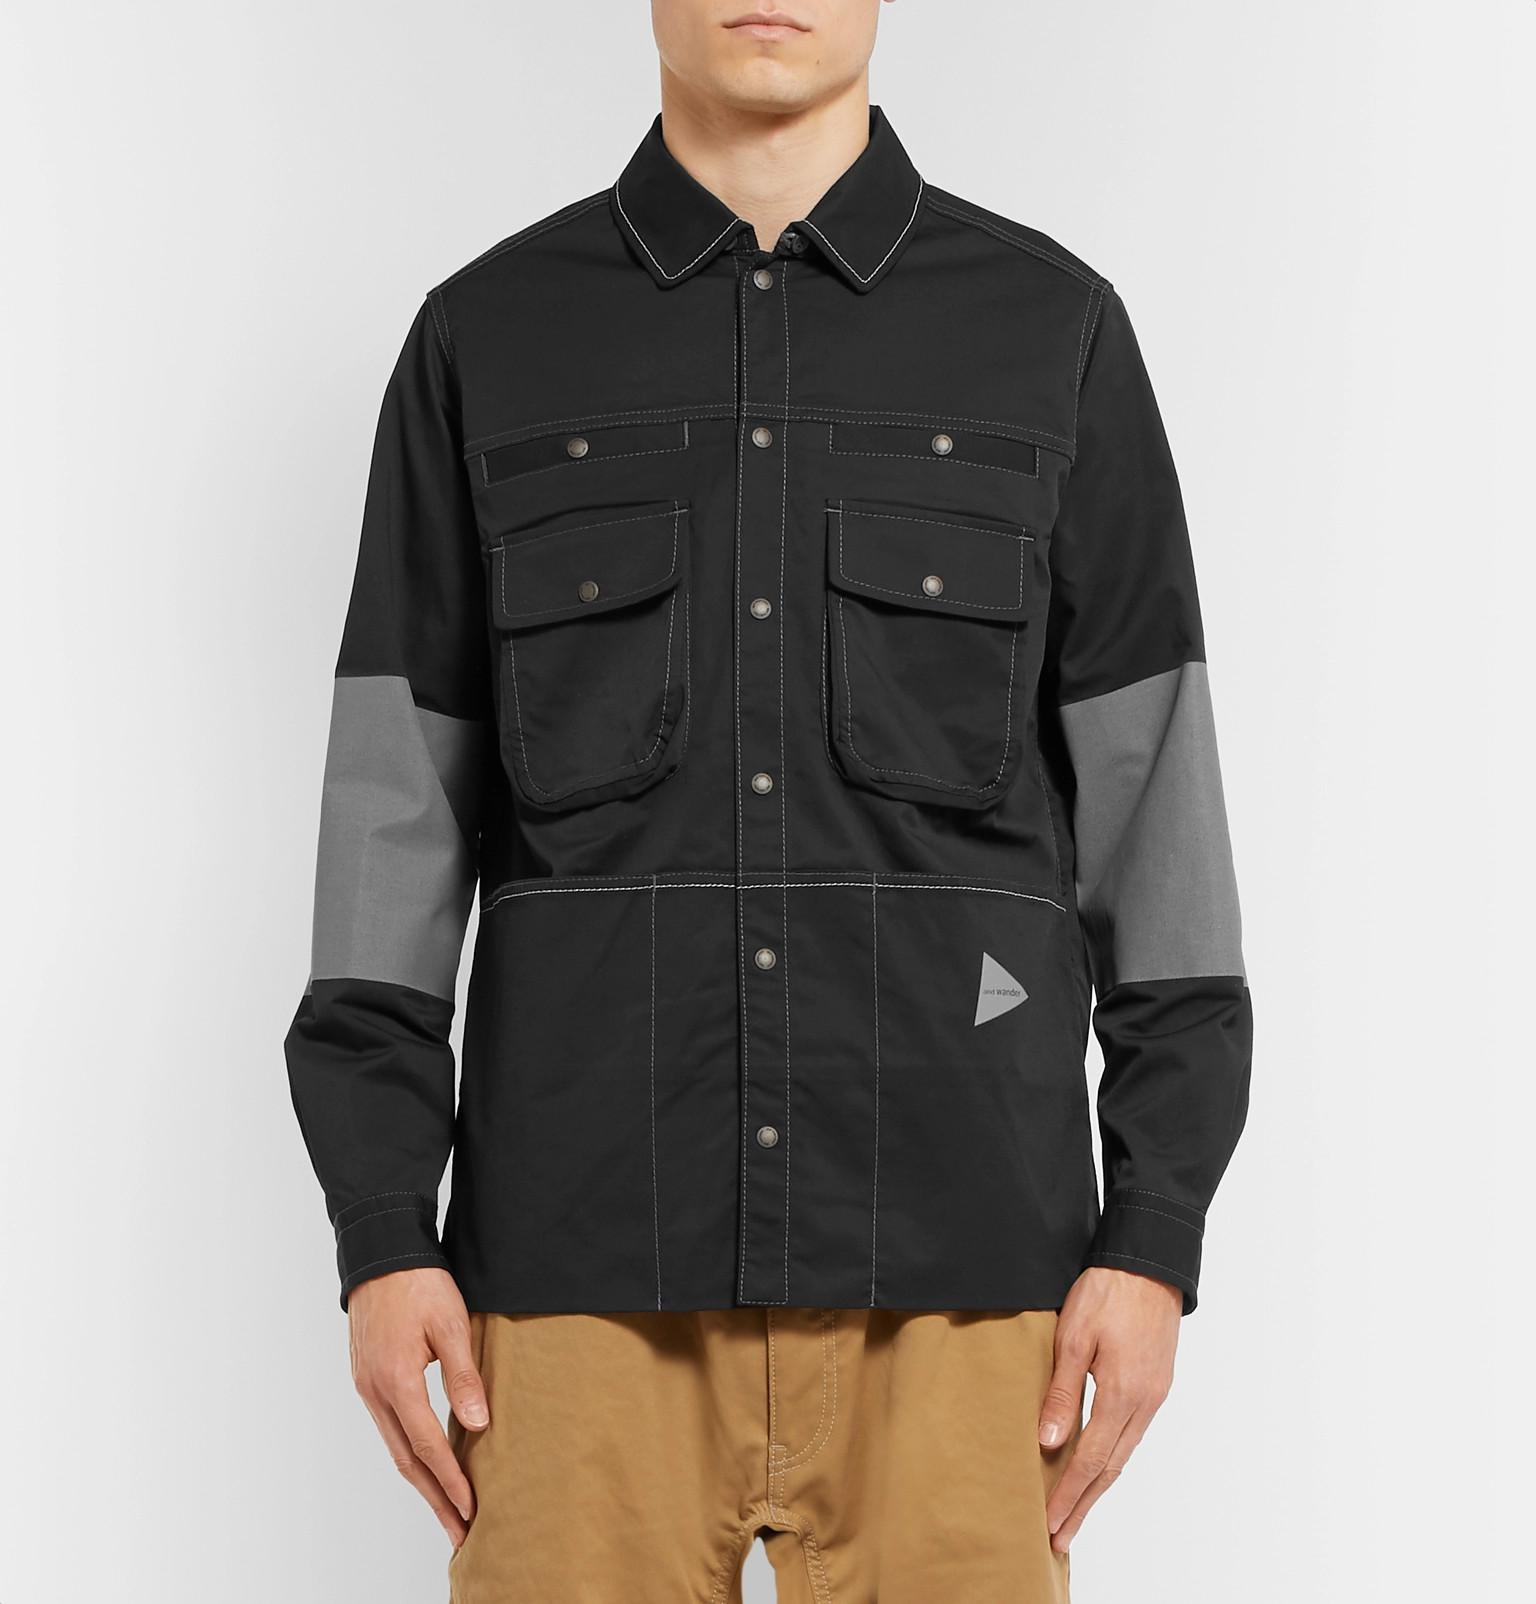 Wanderandover And Jacket Shirt Panelled Reflective Cordura zSvZBw